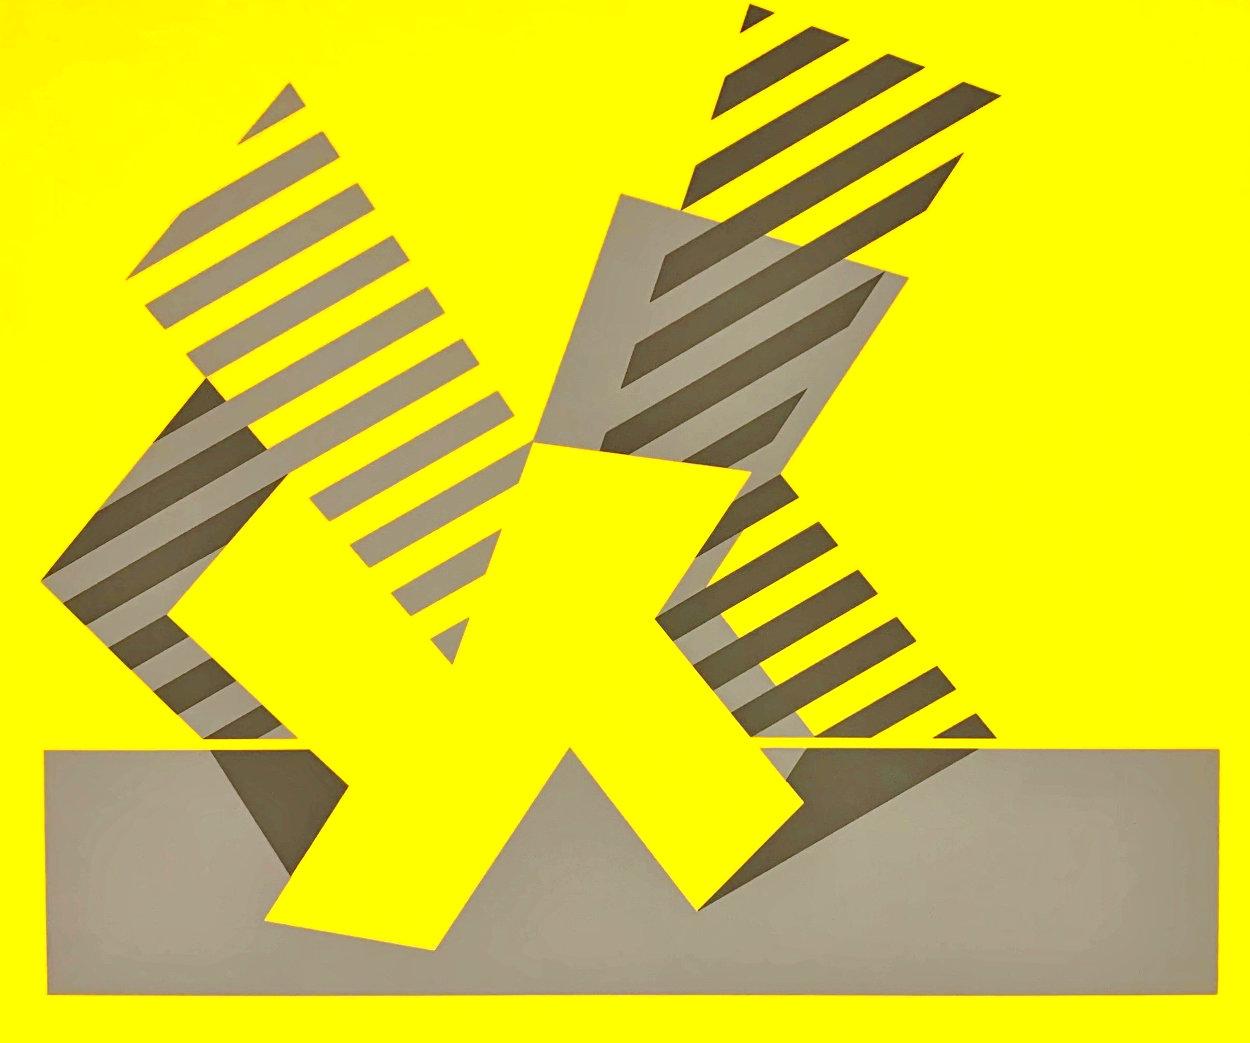 Formulation: Articulation, Portfolio 1 Folder 4 1972 Limited Edition Print by Josef Albers